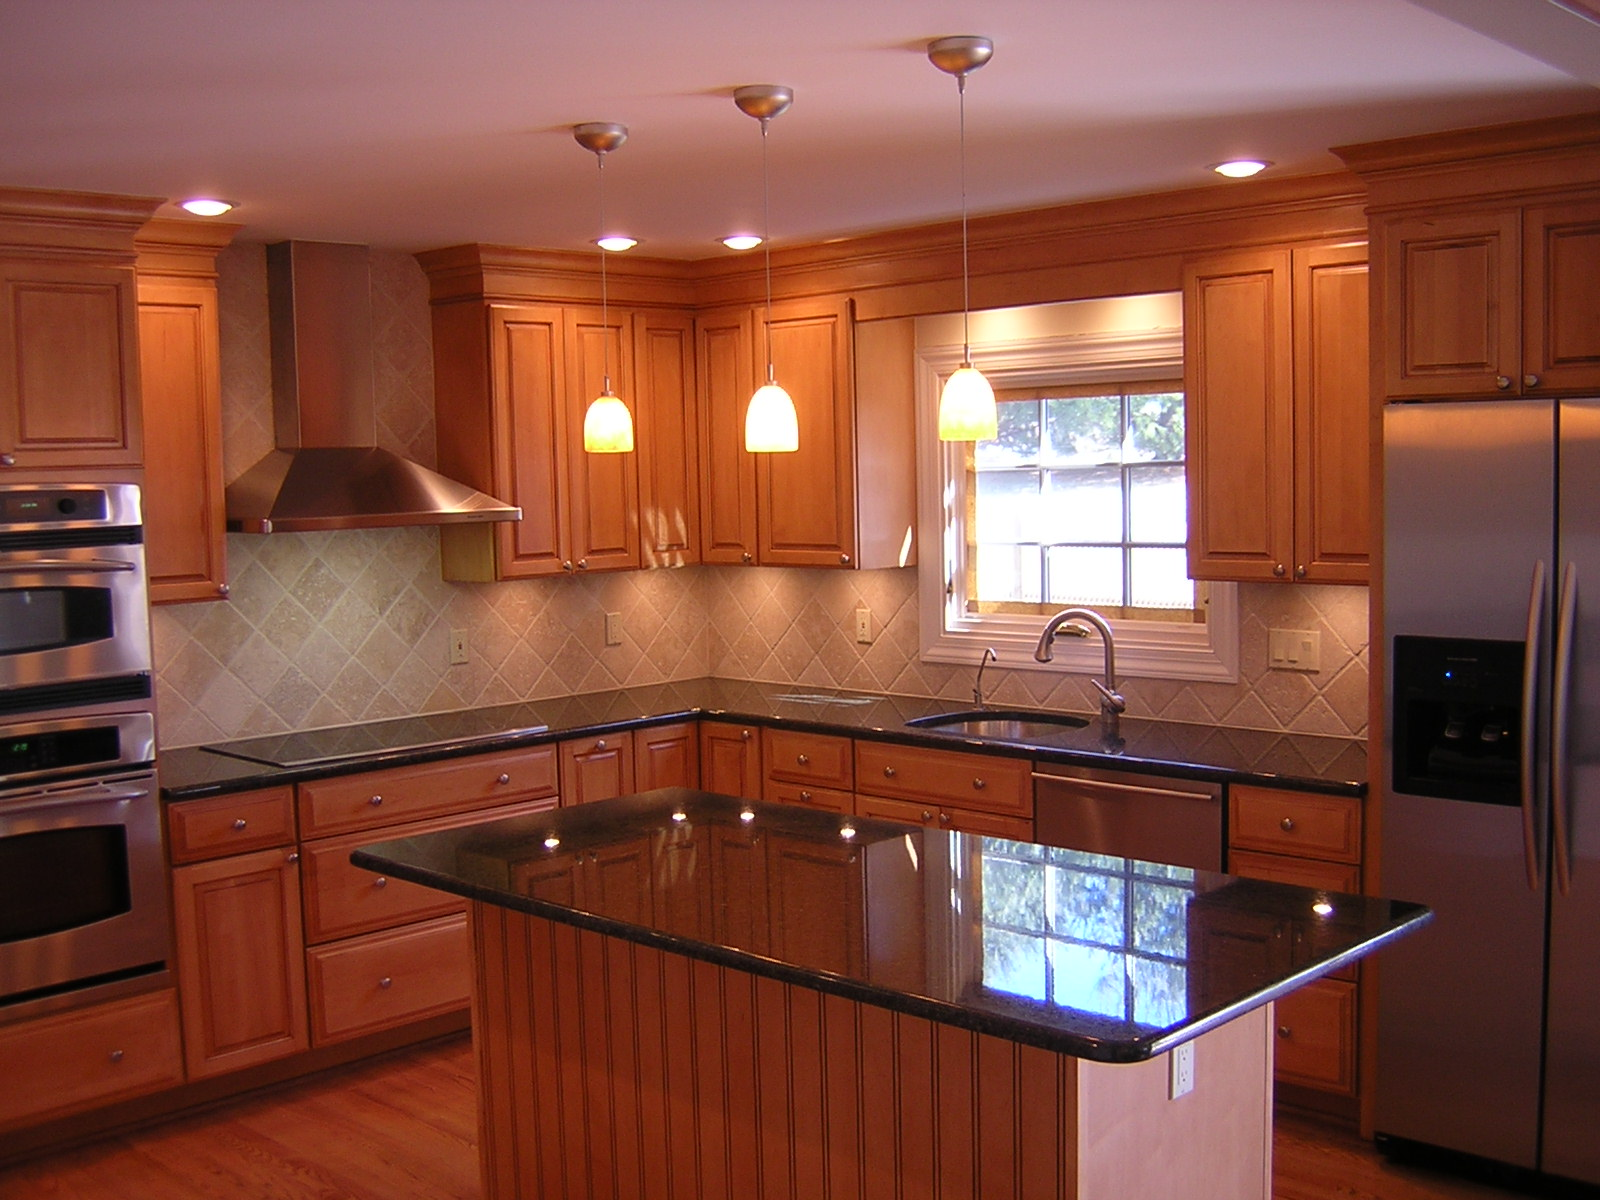 granite kitchen designs photo - 1